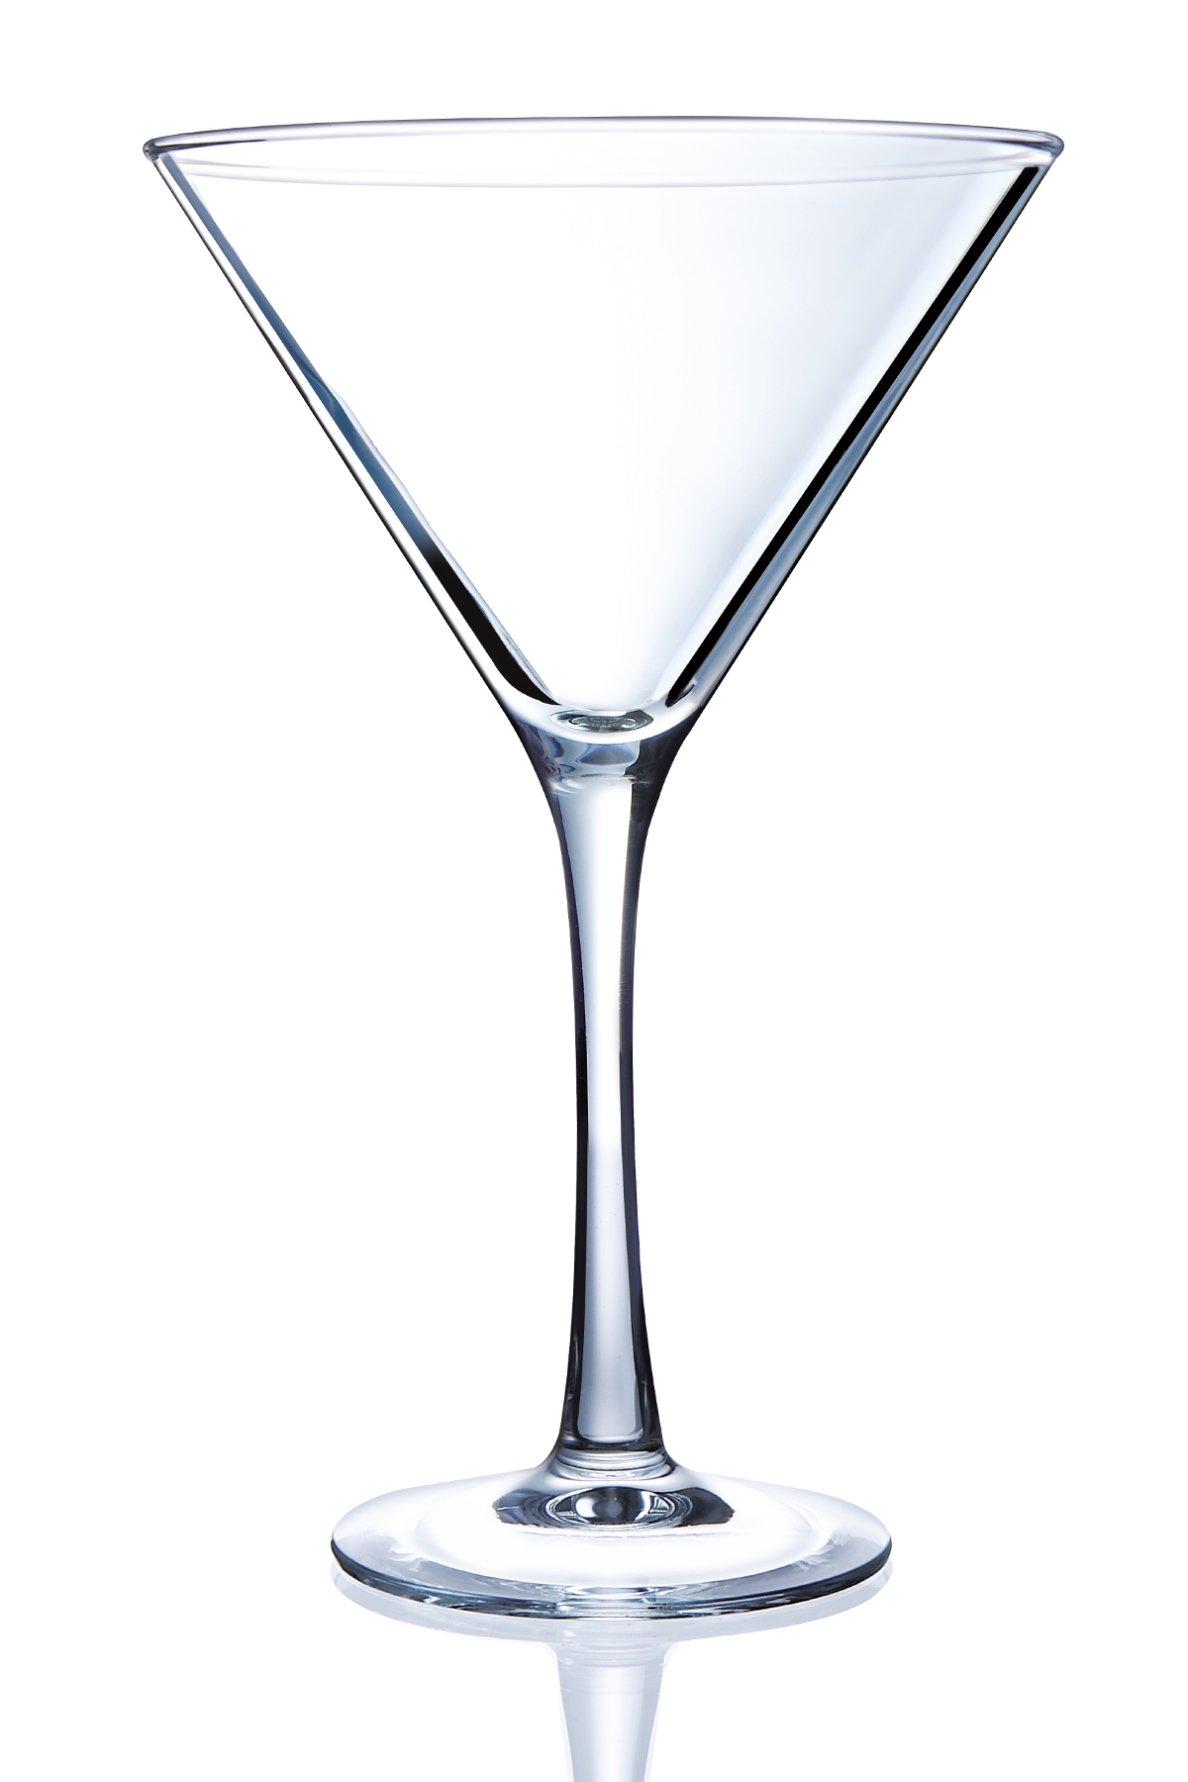 Arc International N1963 Luminarc 4 Piece Cachet Martini Glass Set, 10 oz, Clear